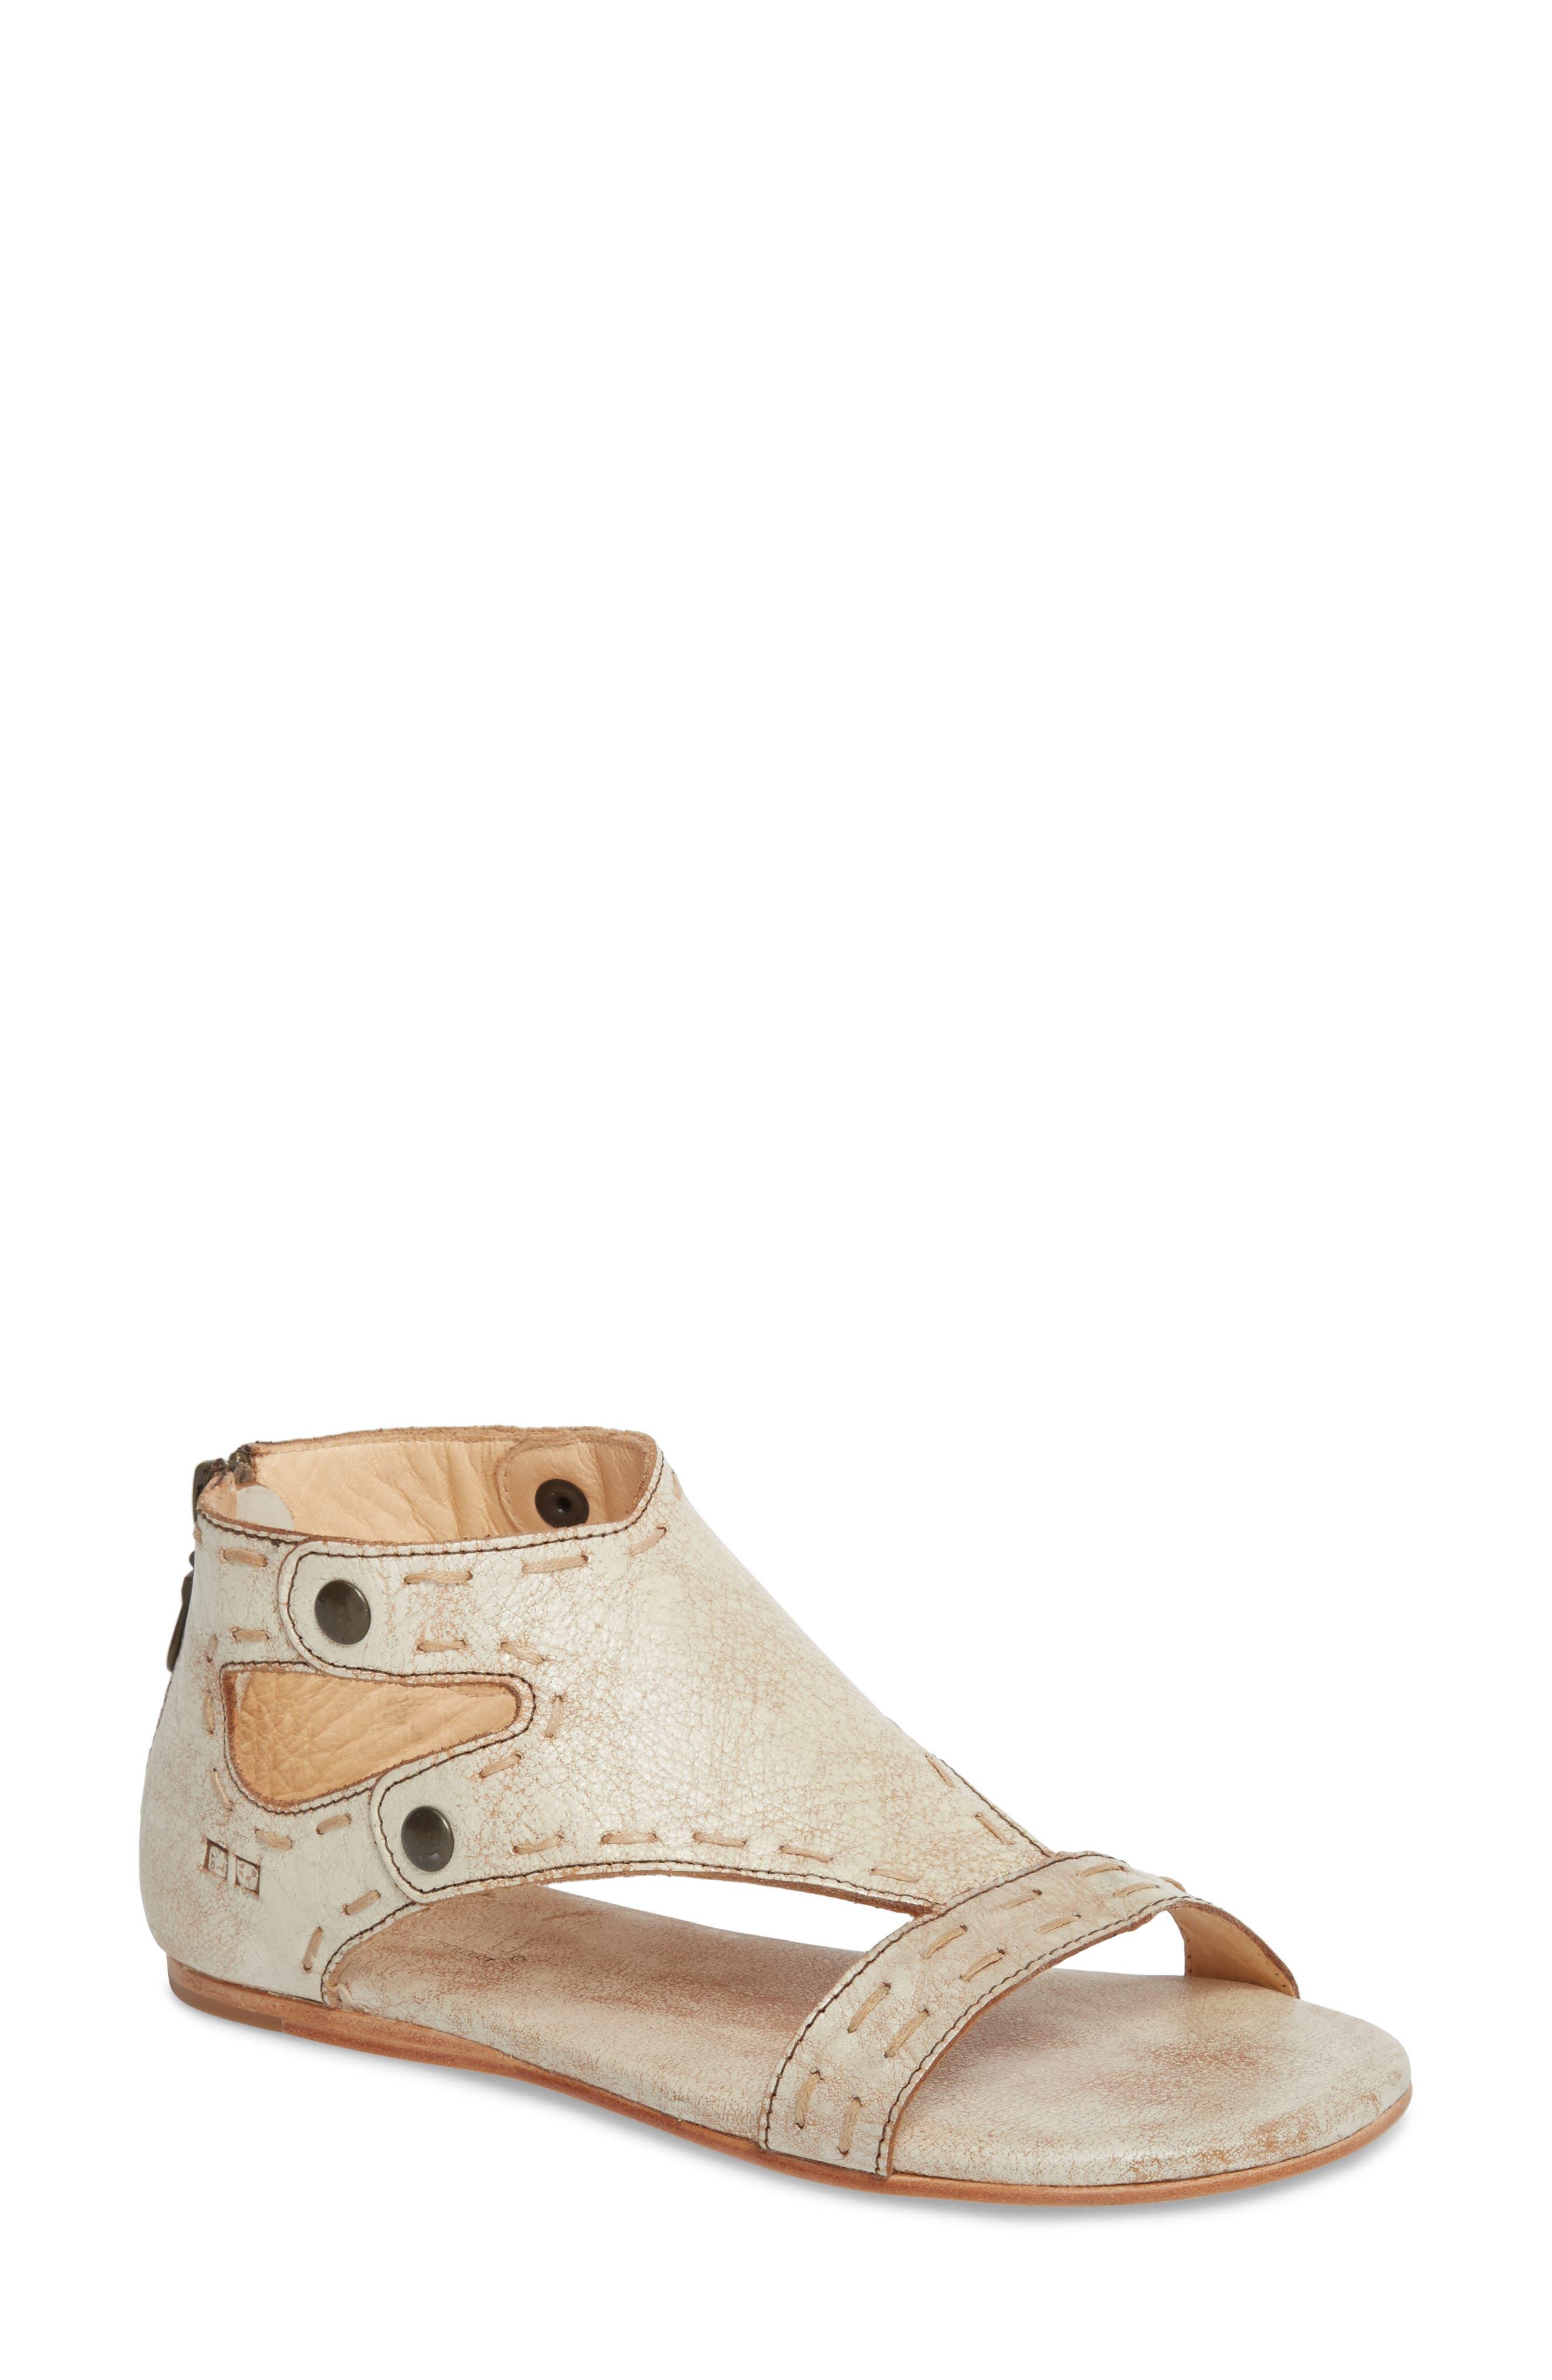 Soto Sandal,                             Main thumbnail 1, color,                             Nectar Leather